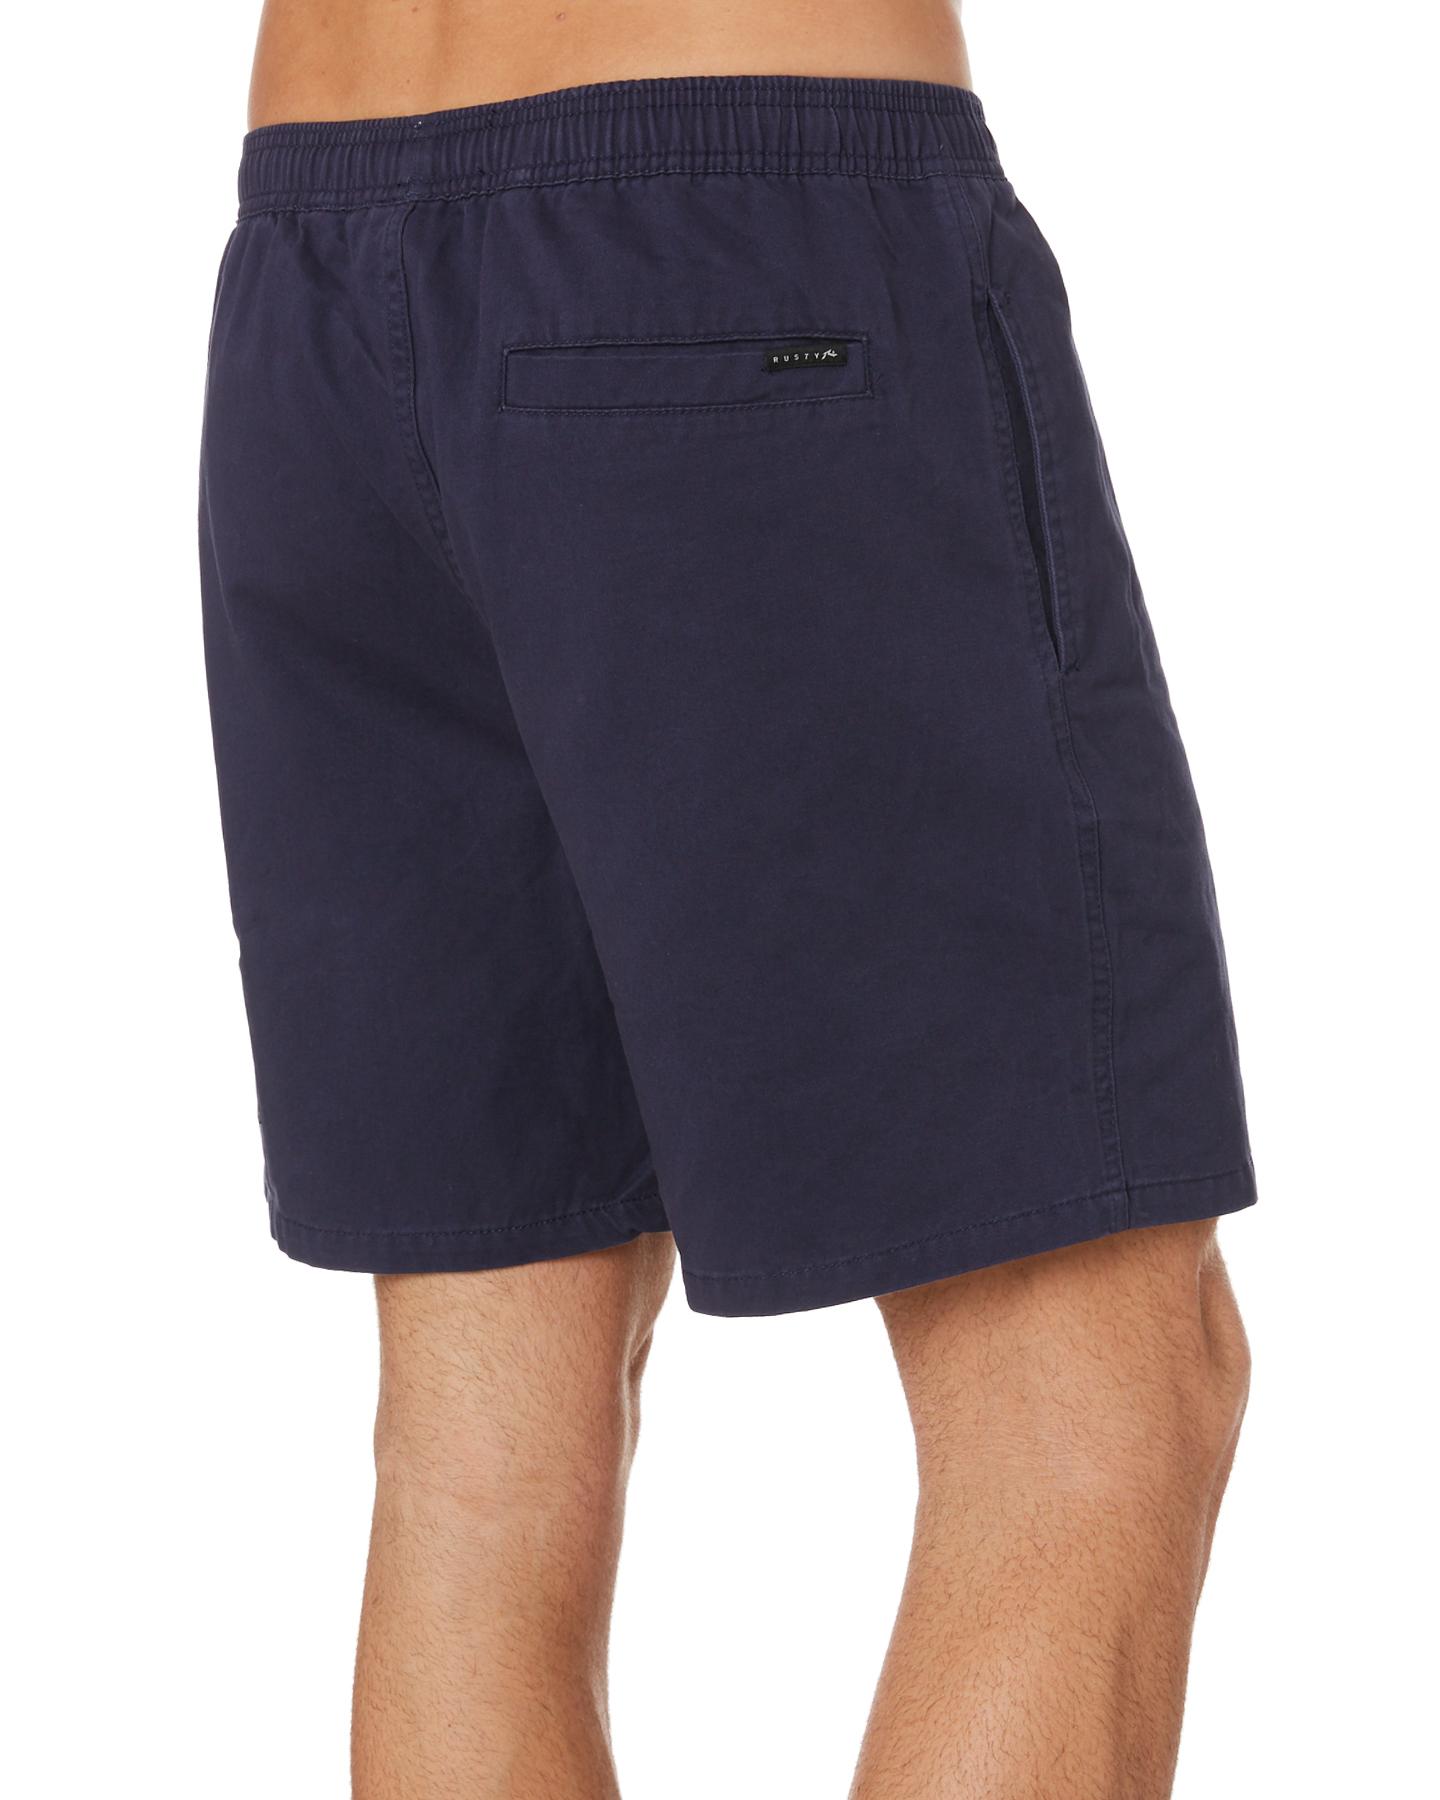 New-Rusty-Men-039-s-Hook-Elastic-Short-Cotton-Blue thumbnail 14